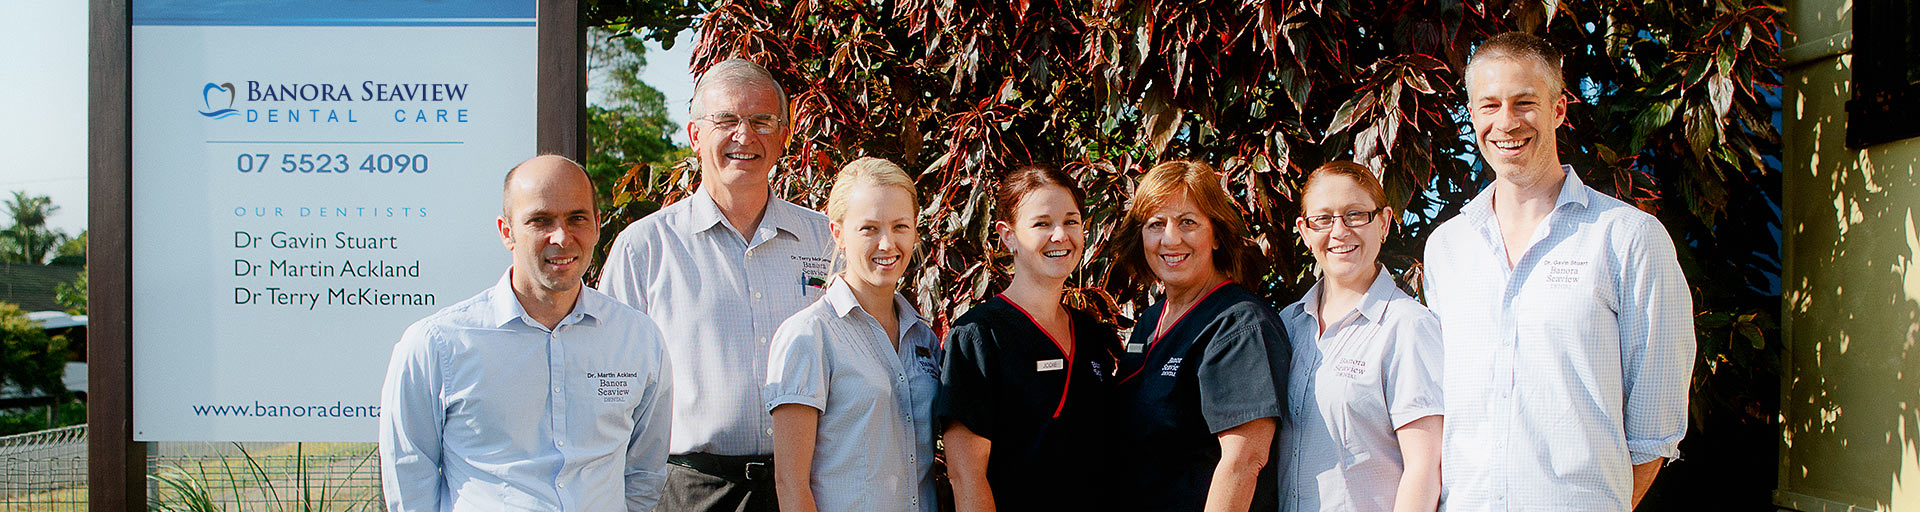 Banora-Seaview-Dental-Care-Team